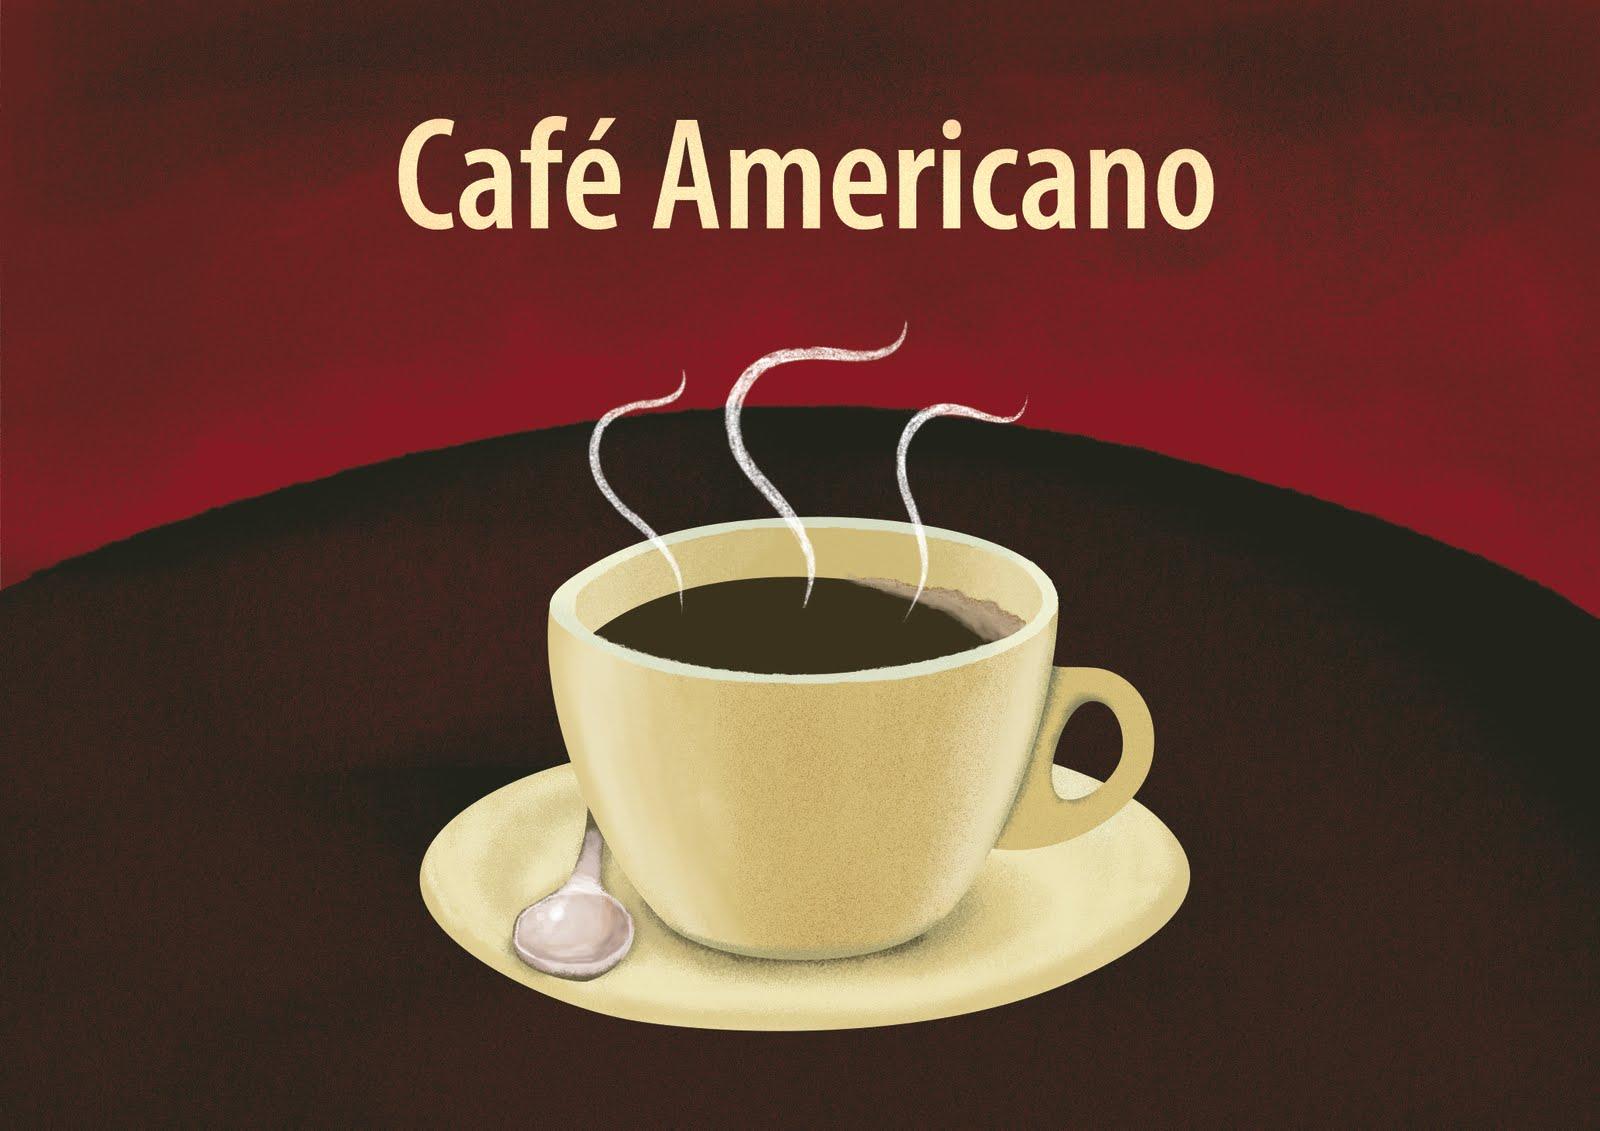 cafe+americano.jpg#Americano